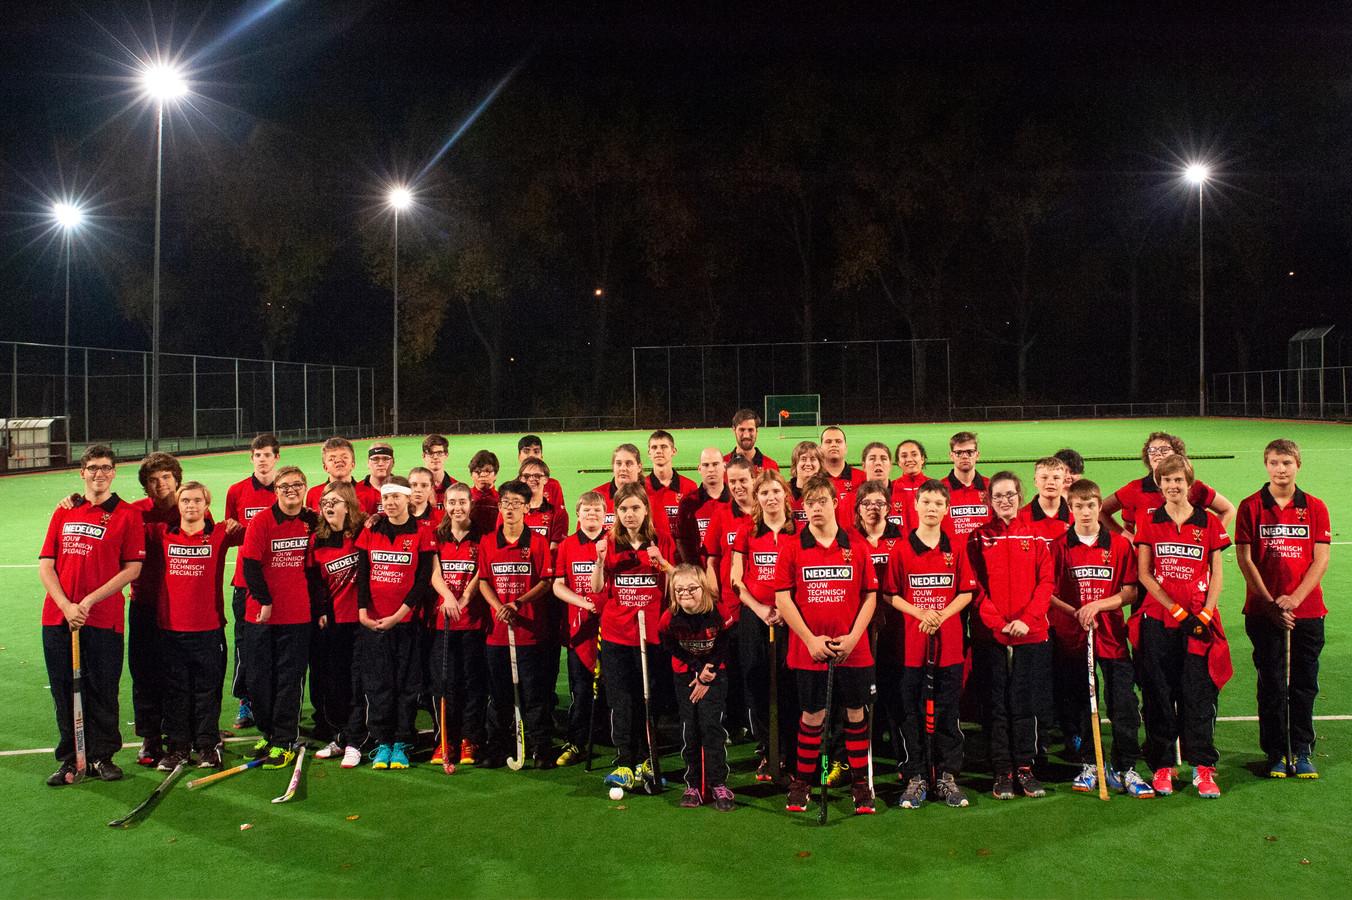 G-hockey Hudito Delft